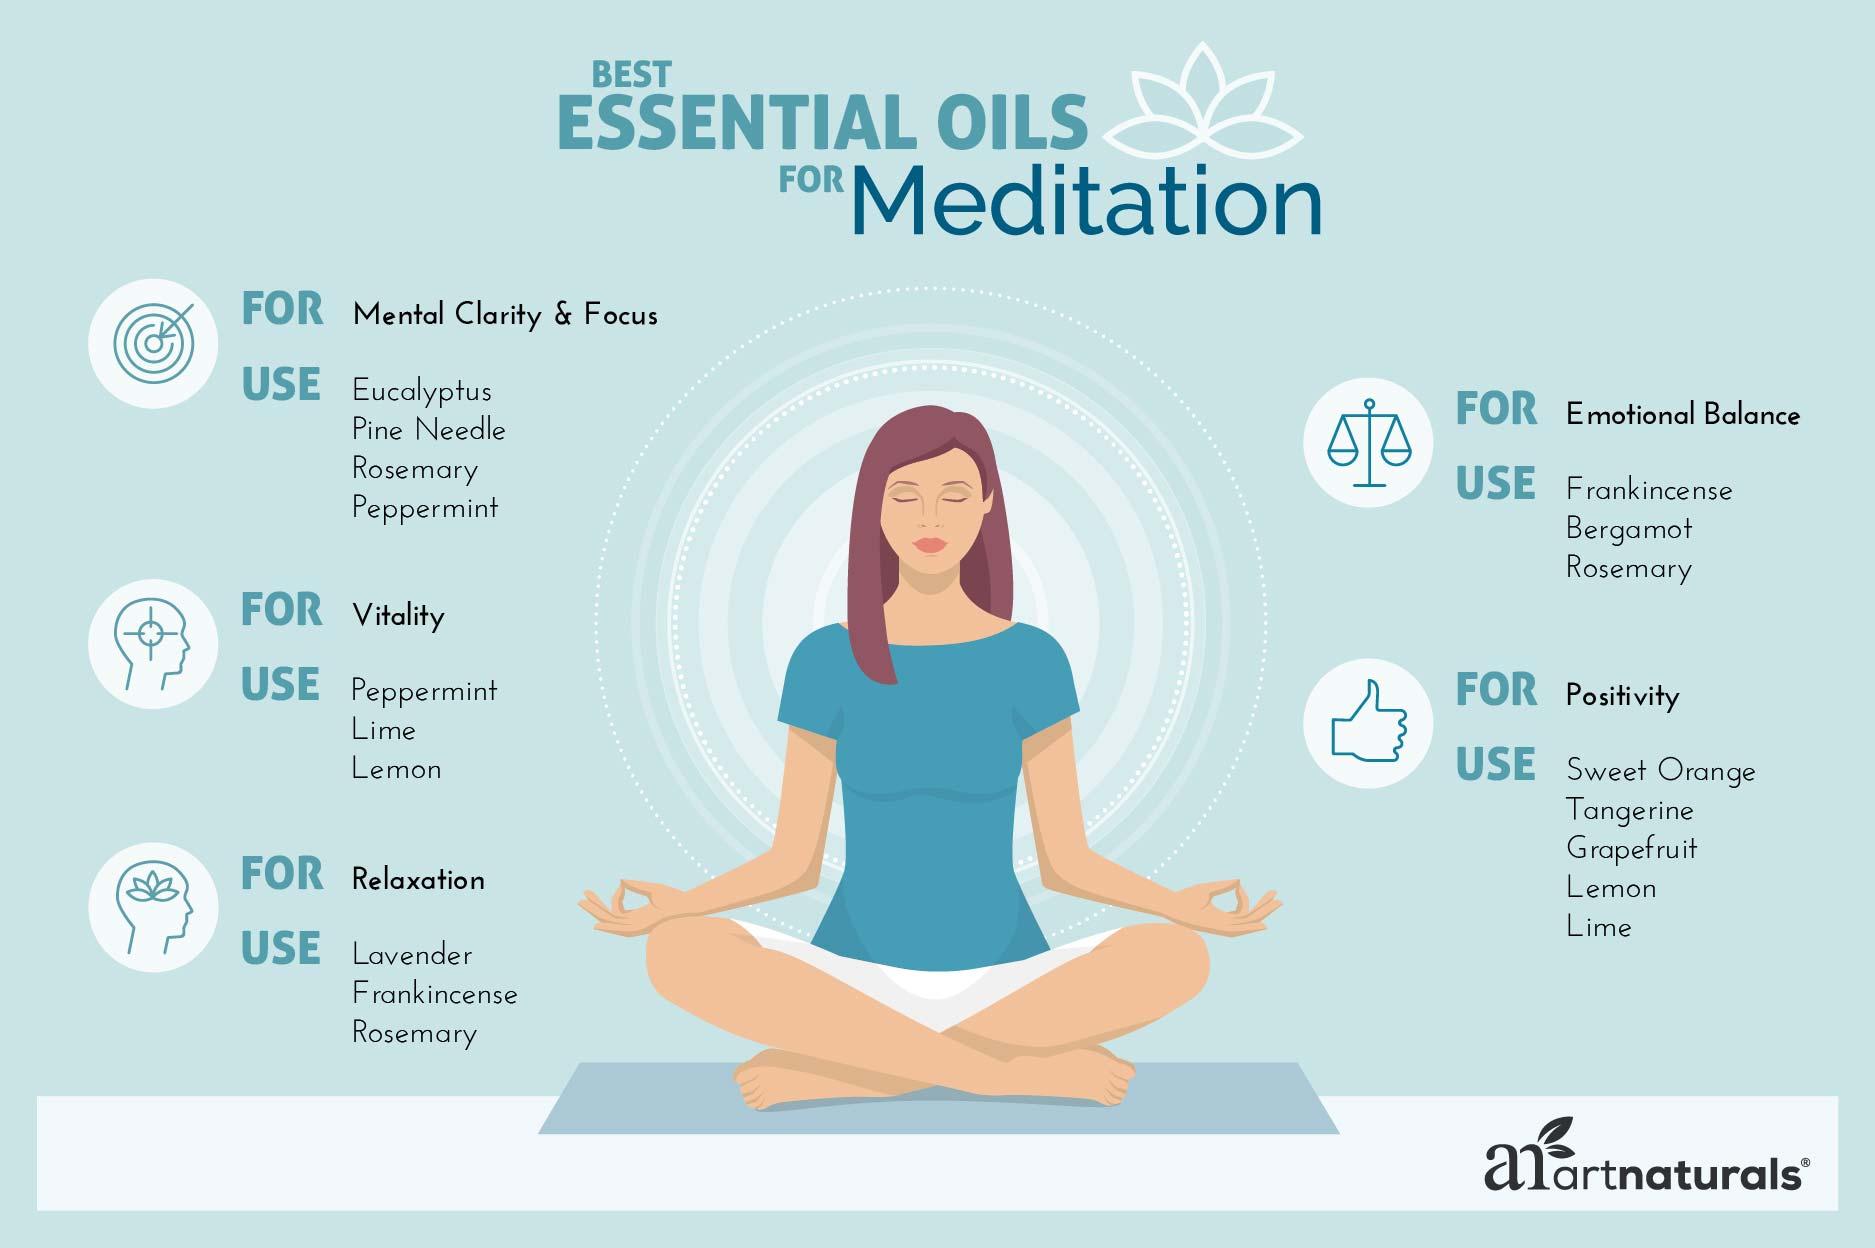 best-essential-oils-for-meditation-infographic